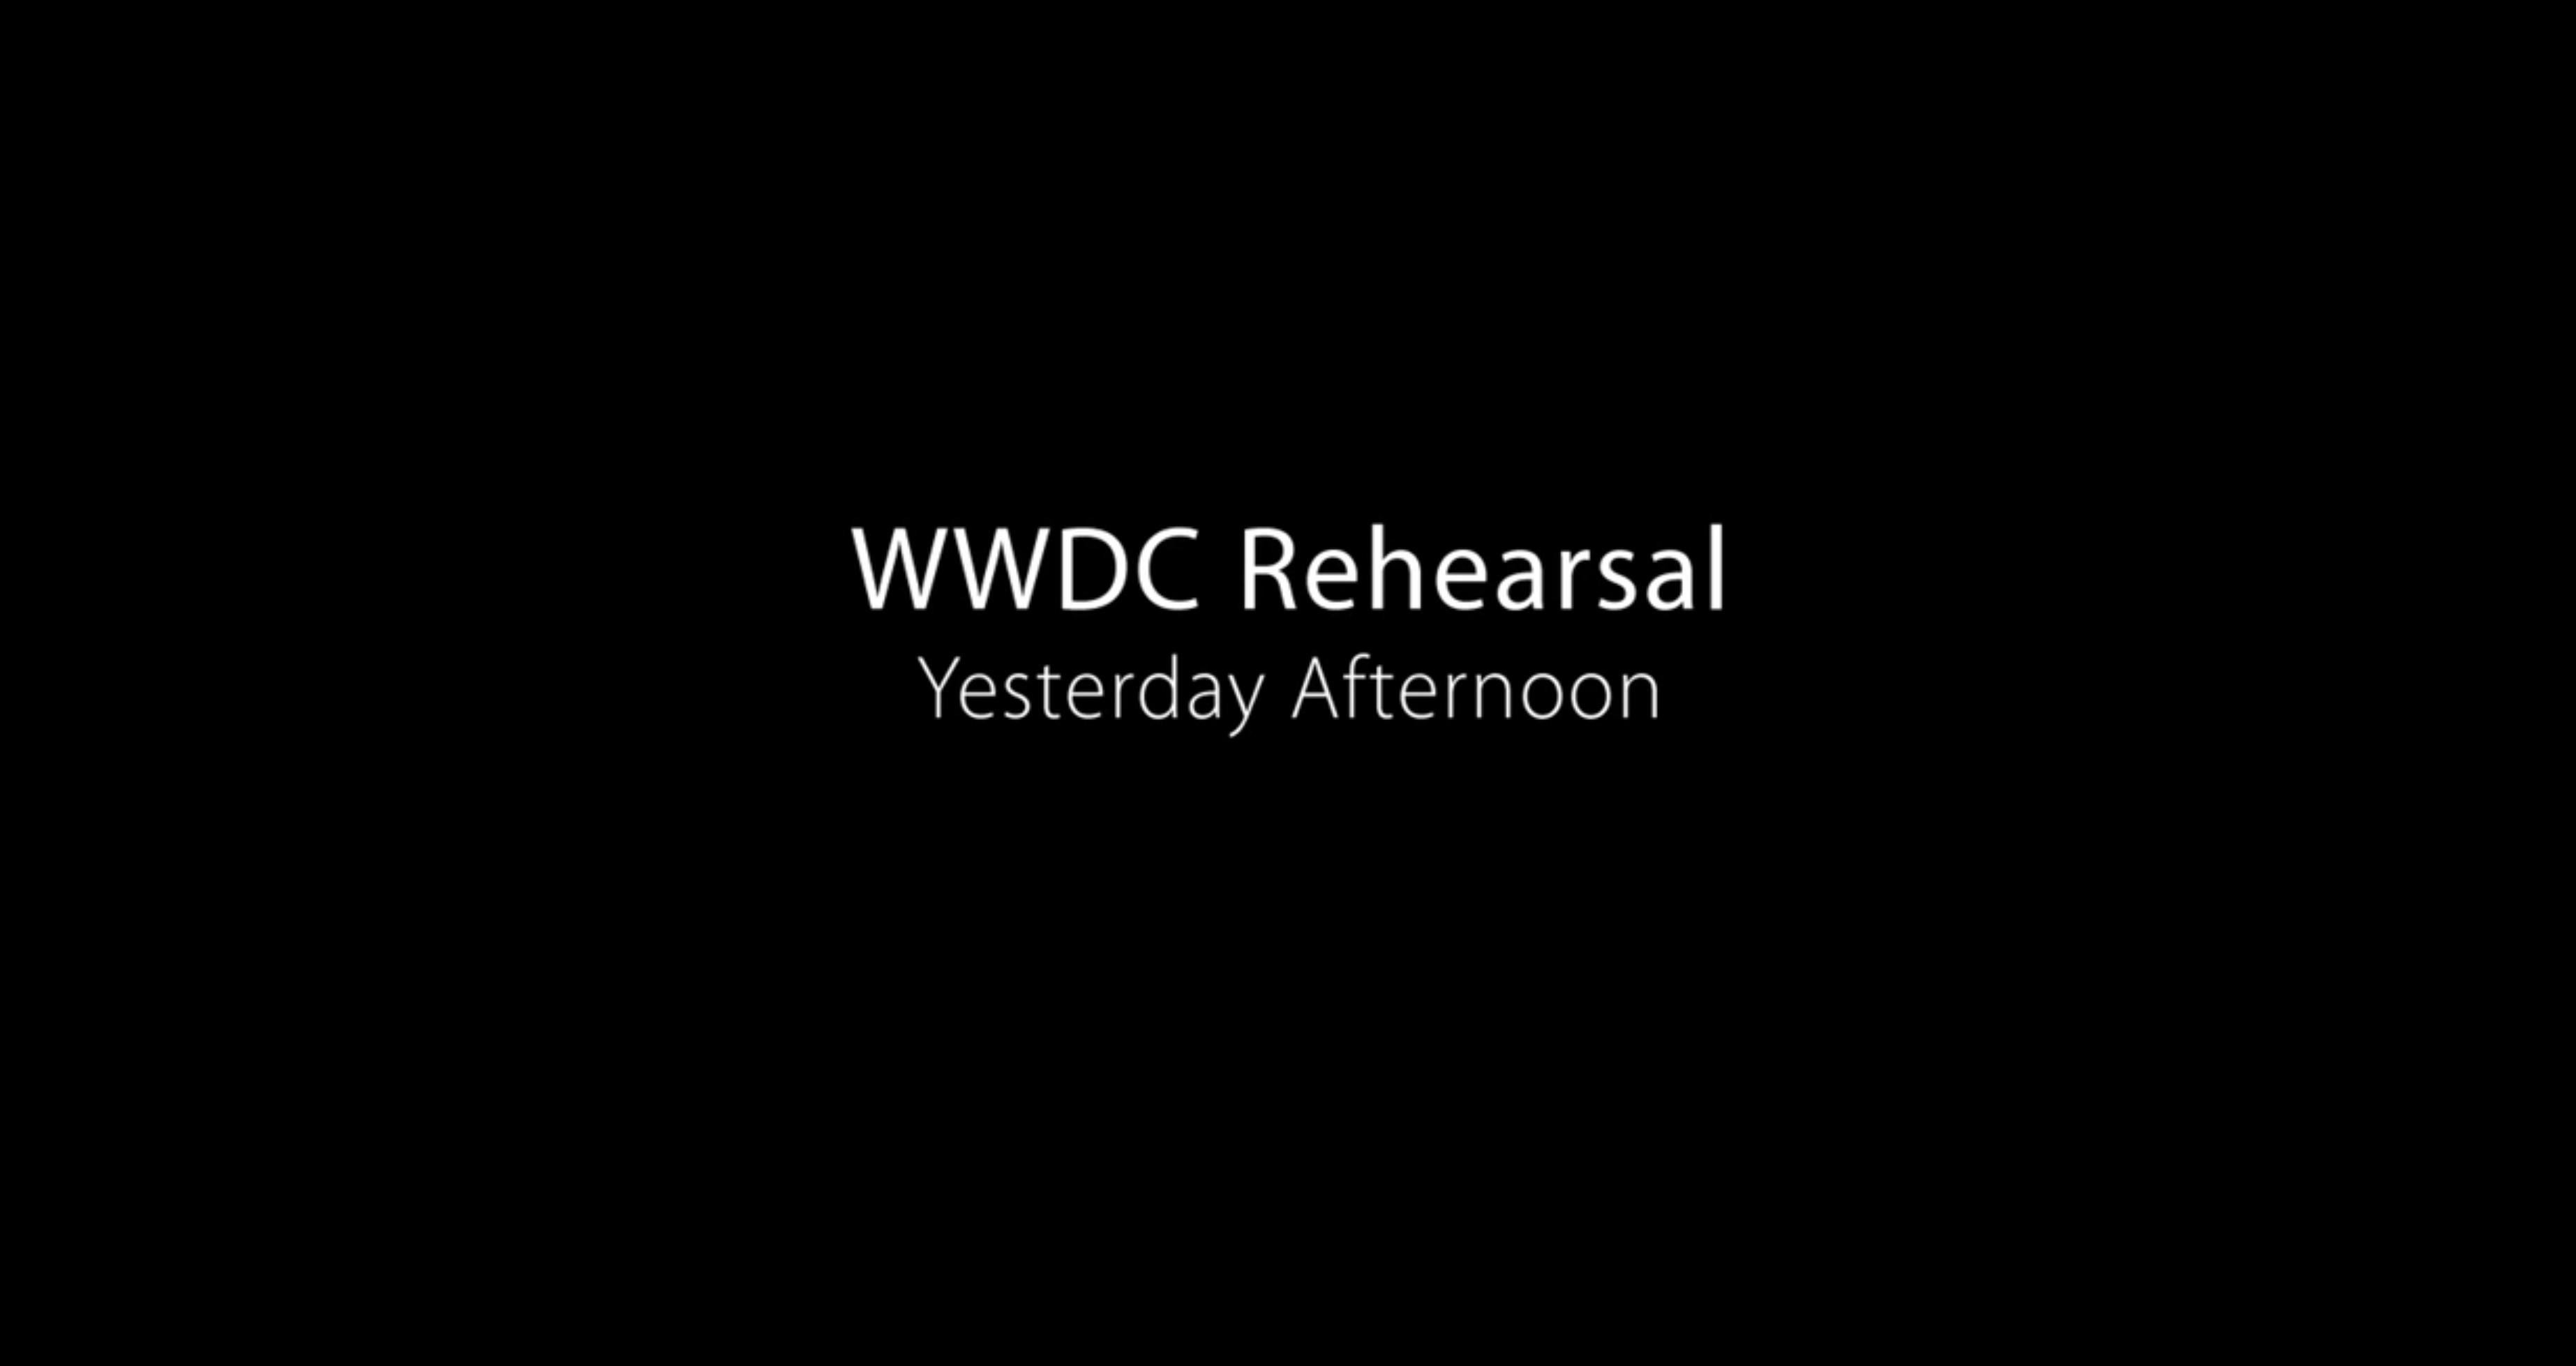 WWDC 15 오프닝 영상 BackStage 공개.